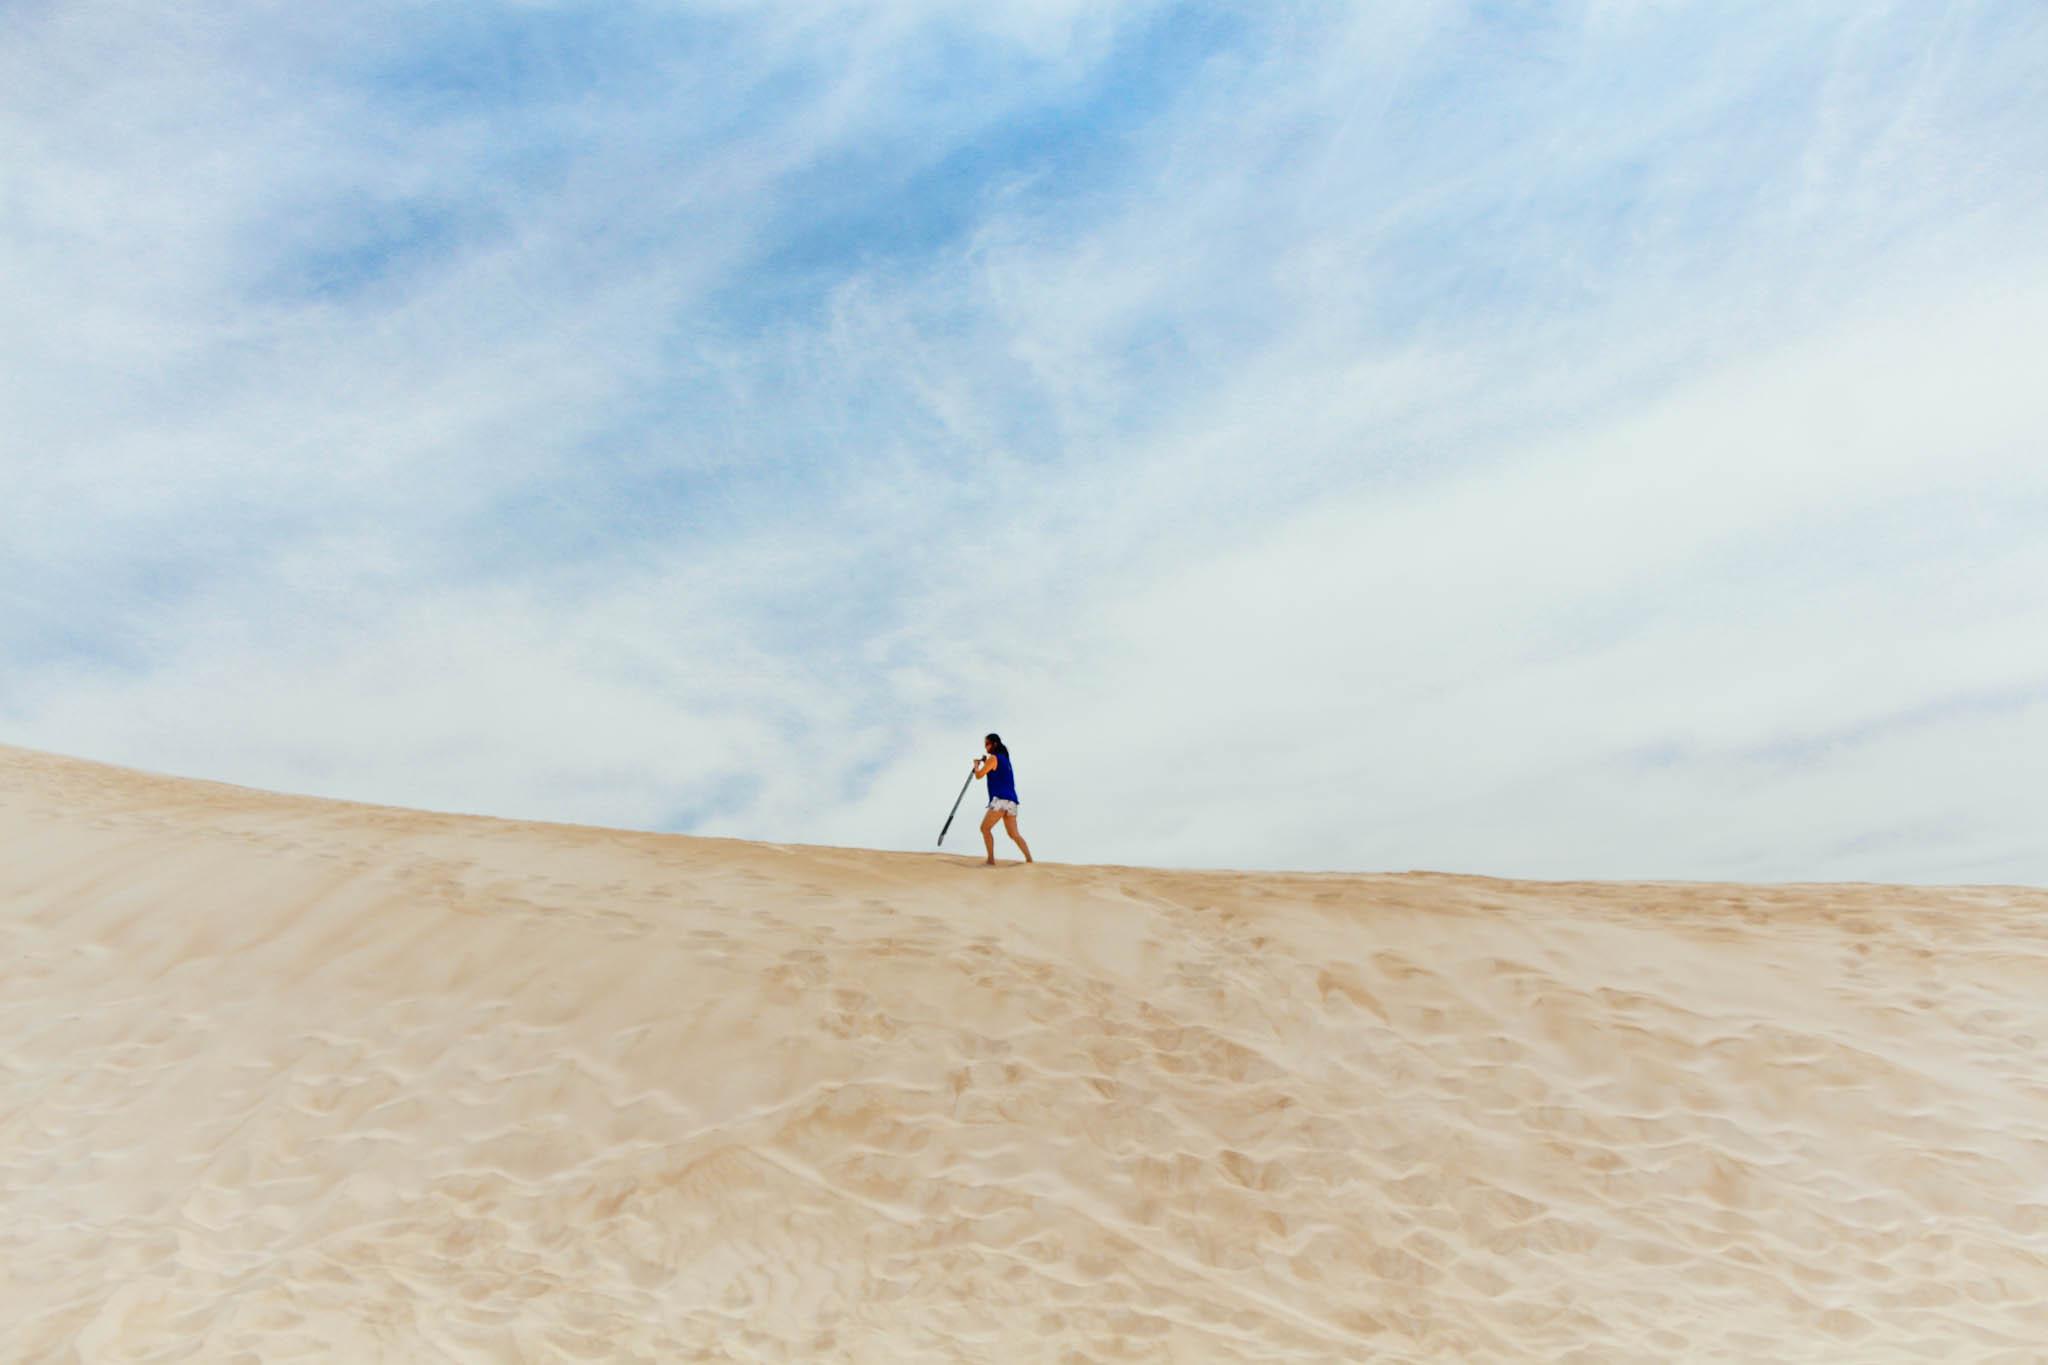 Lancelin Sand Dunes, Western Australia, Australia